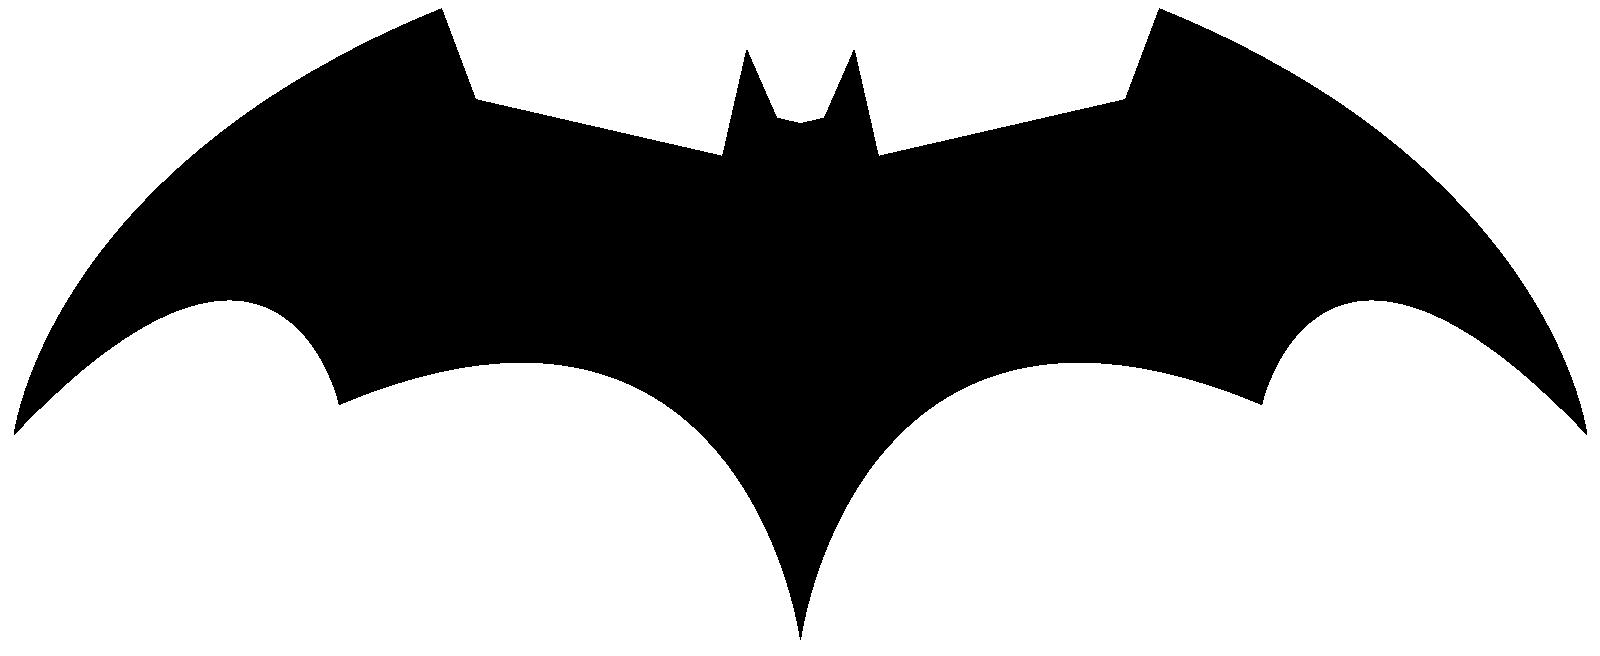 Batman logo vector #2048 - Free Transparent PNG Logos